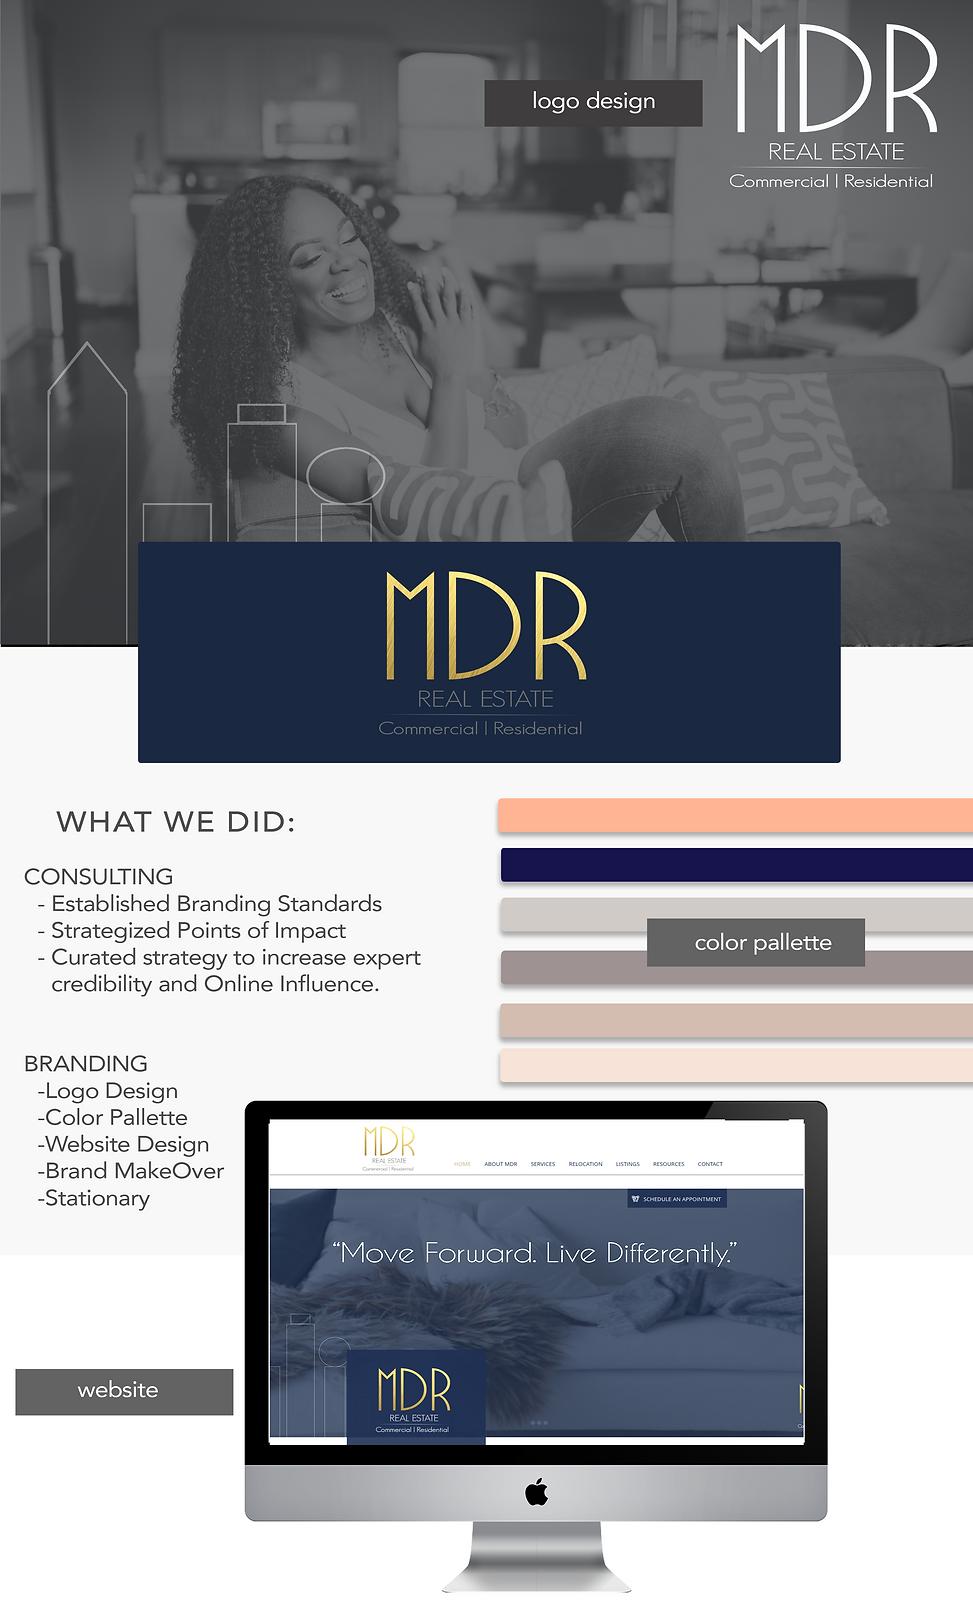 MDR Case Study-1.png